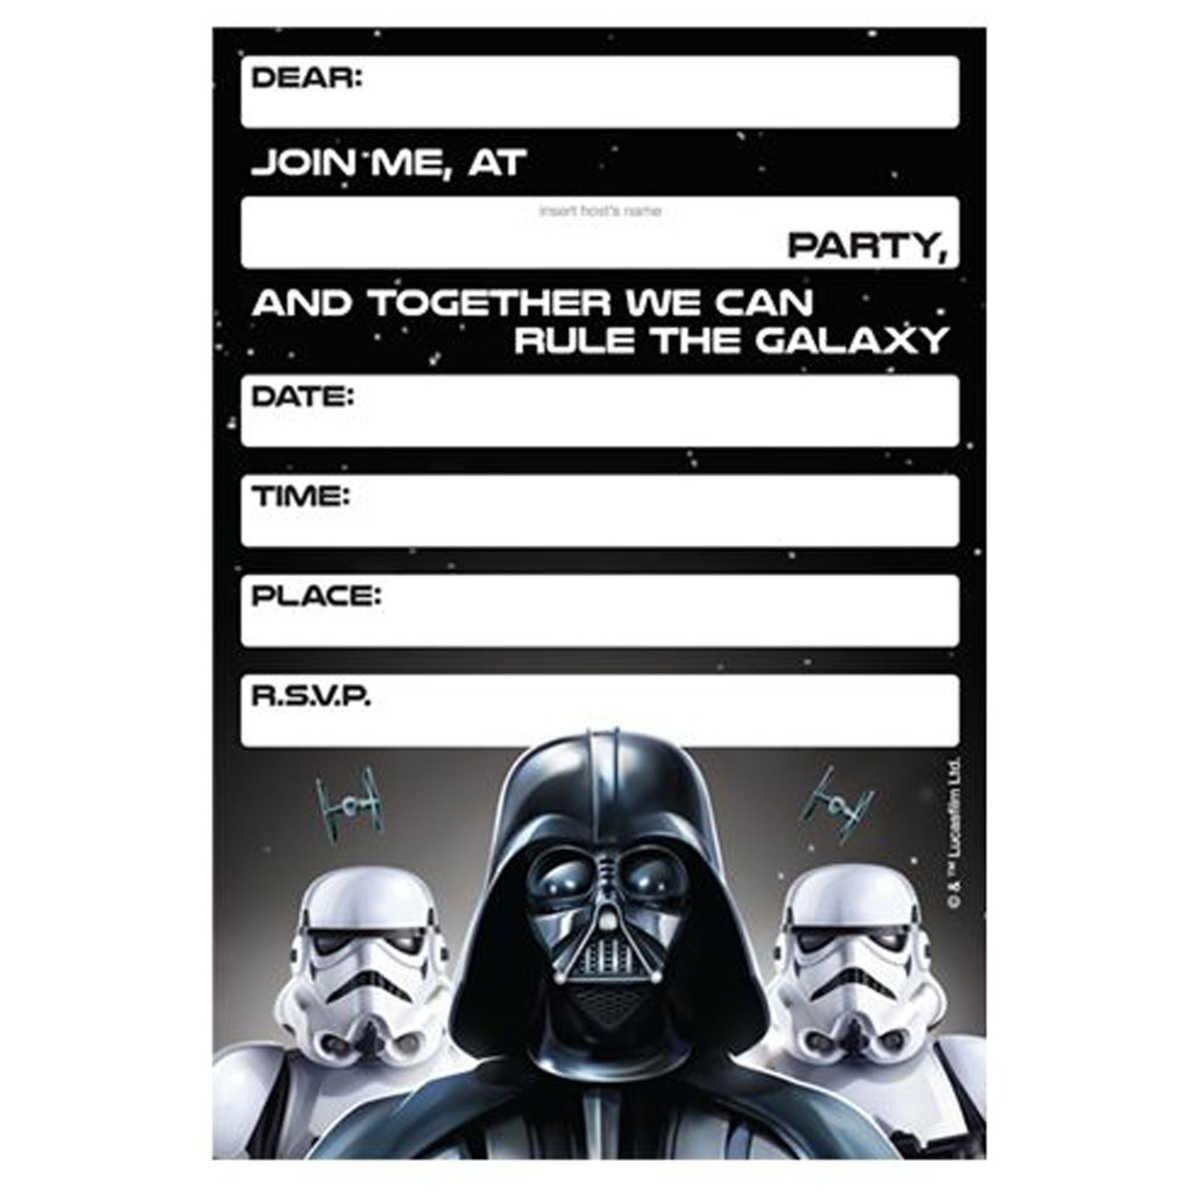 Lego Star Wars Birthday Invitations Template Free Printable Birthday Invitation Templates Bagvania